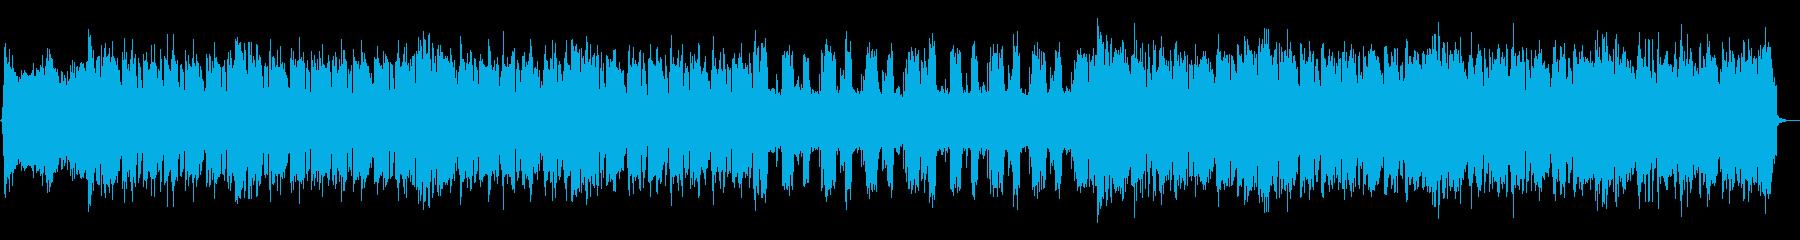 eSports サイバー ロックの再生済みの波形